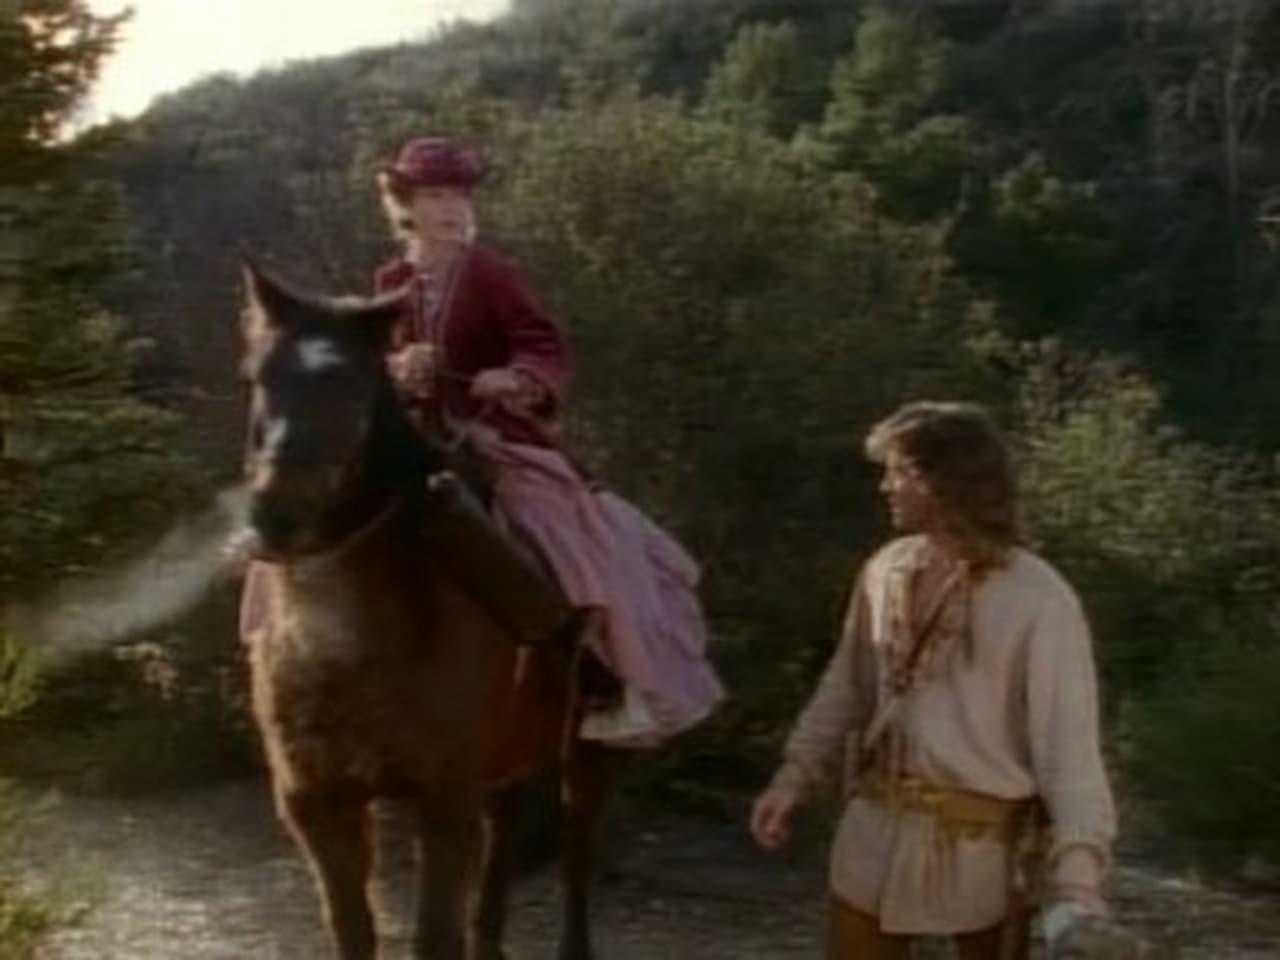 Dr. Quinn, Medicine Woman - Season 1 Episode 1 : Pilot (1998)